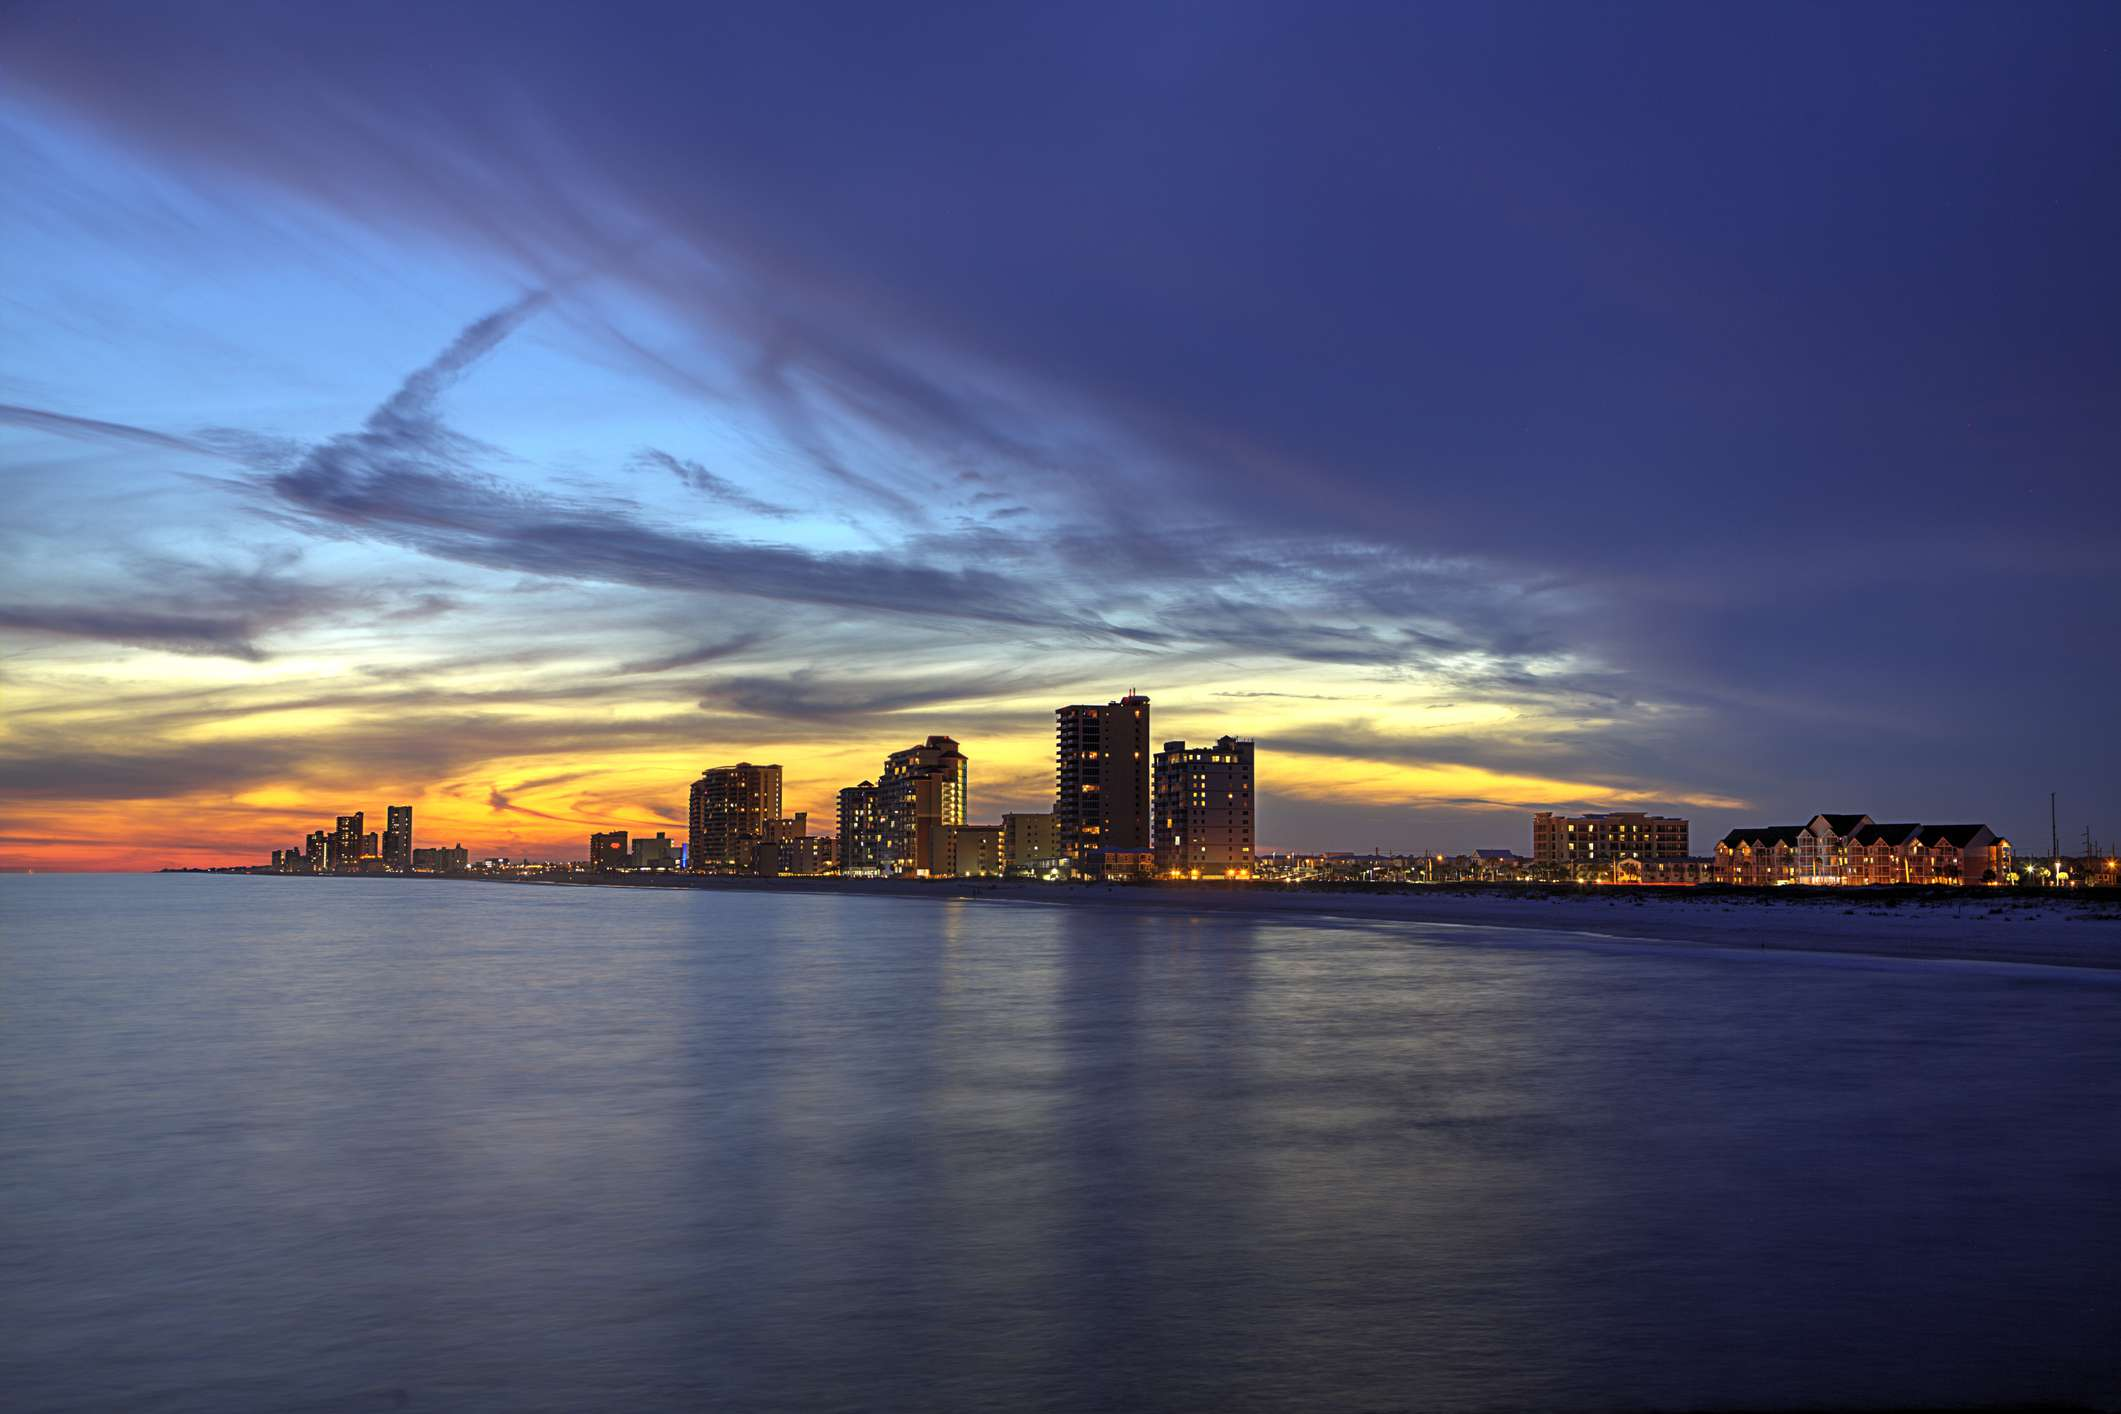 Gulf Shores at Dusk